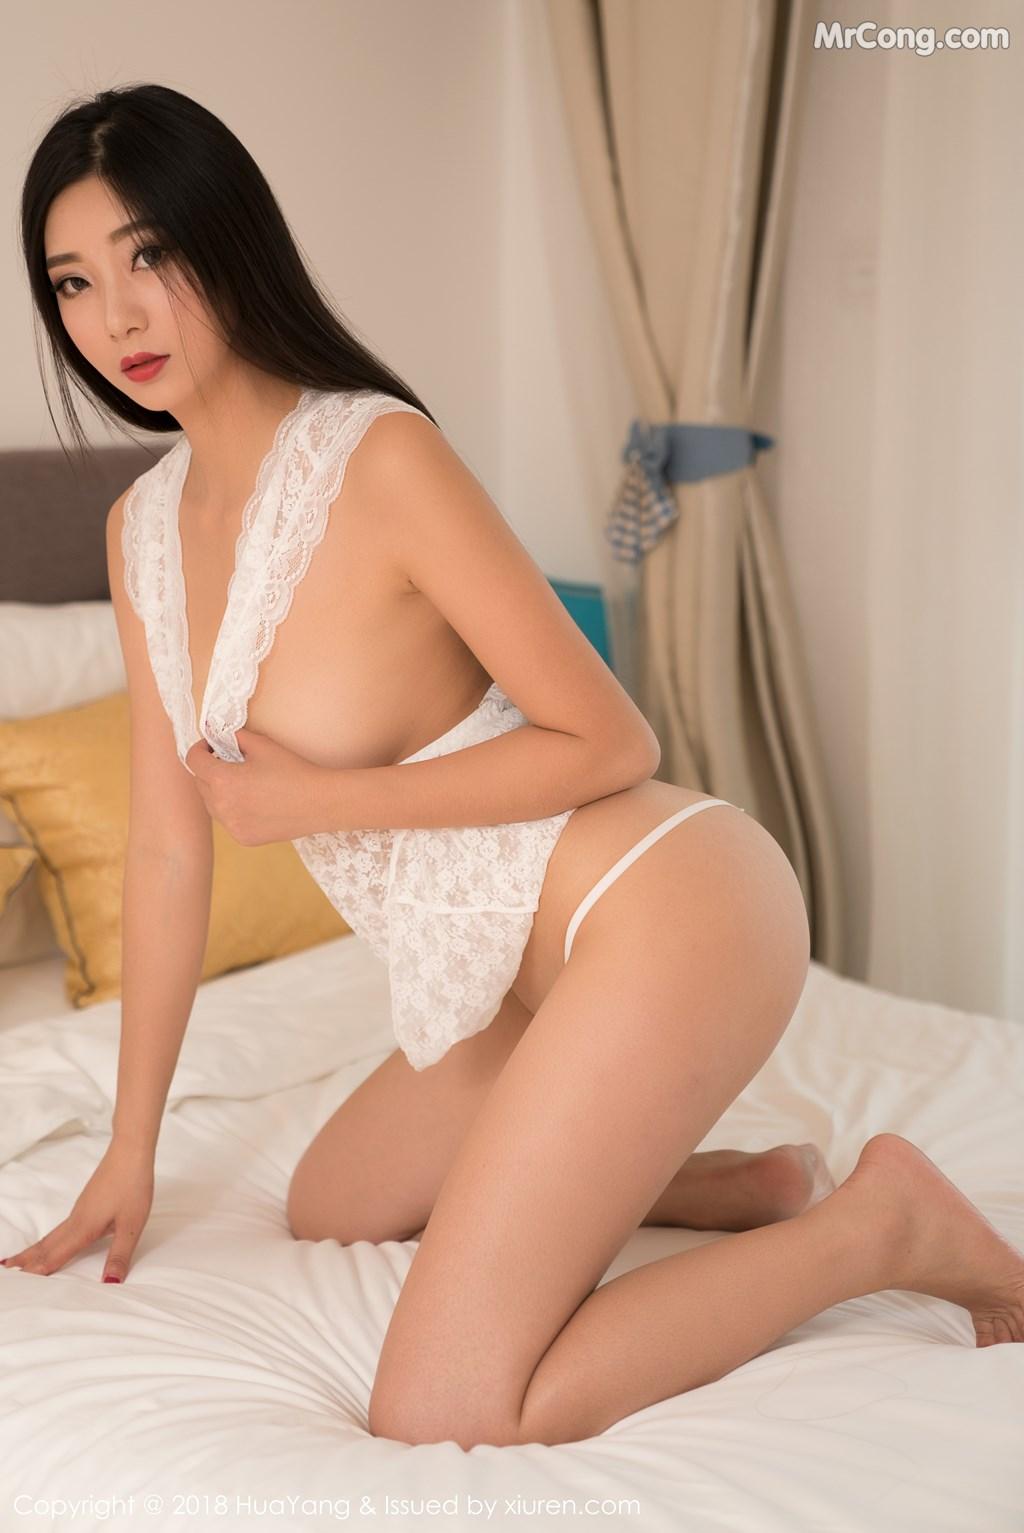 Image HuaYang-2018-02-28-Vol.033-KiKi-MrCong.com-004 in post HuaYang 2018-02-28 Vol.033: Người mẫu 宋-KiKi (42 ảnh)